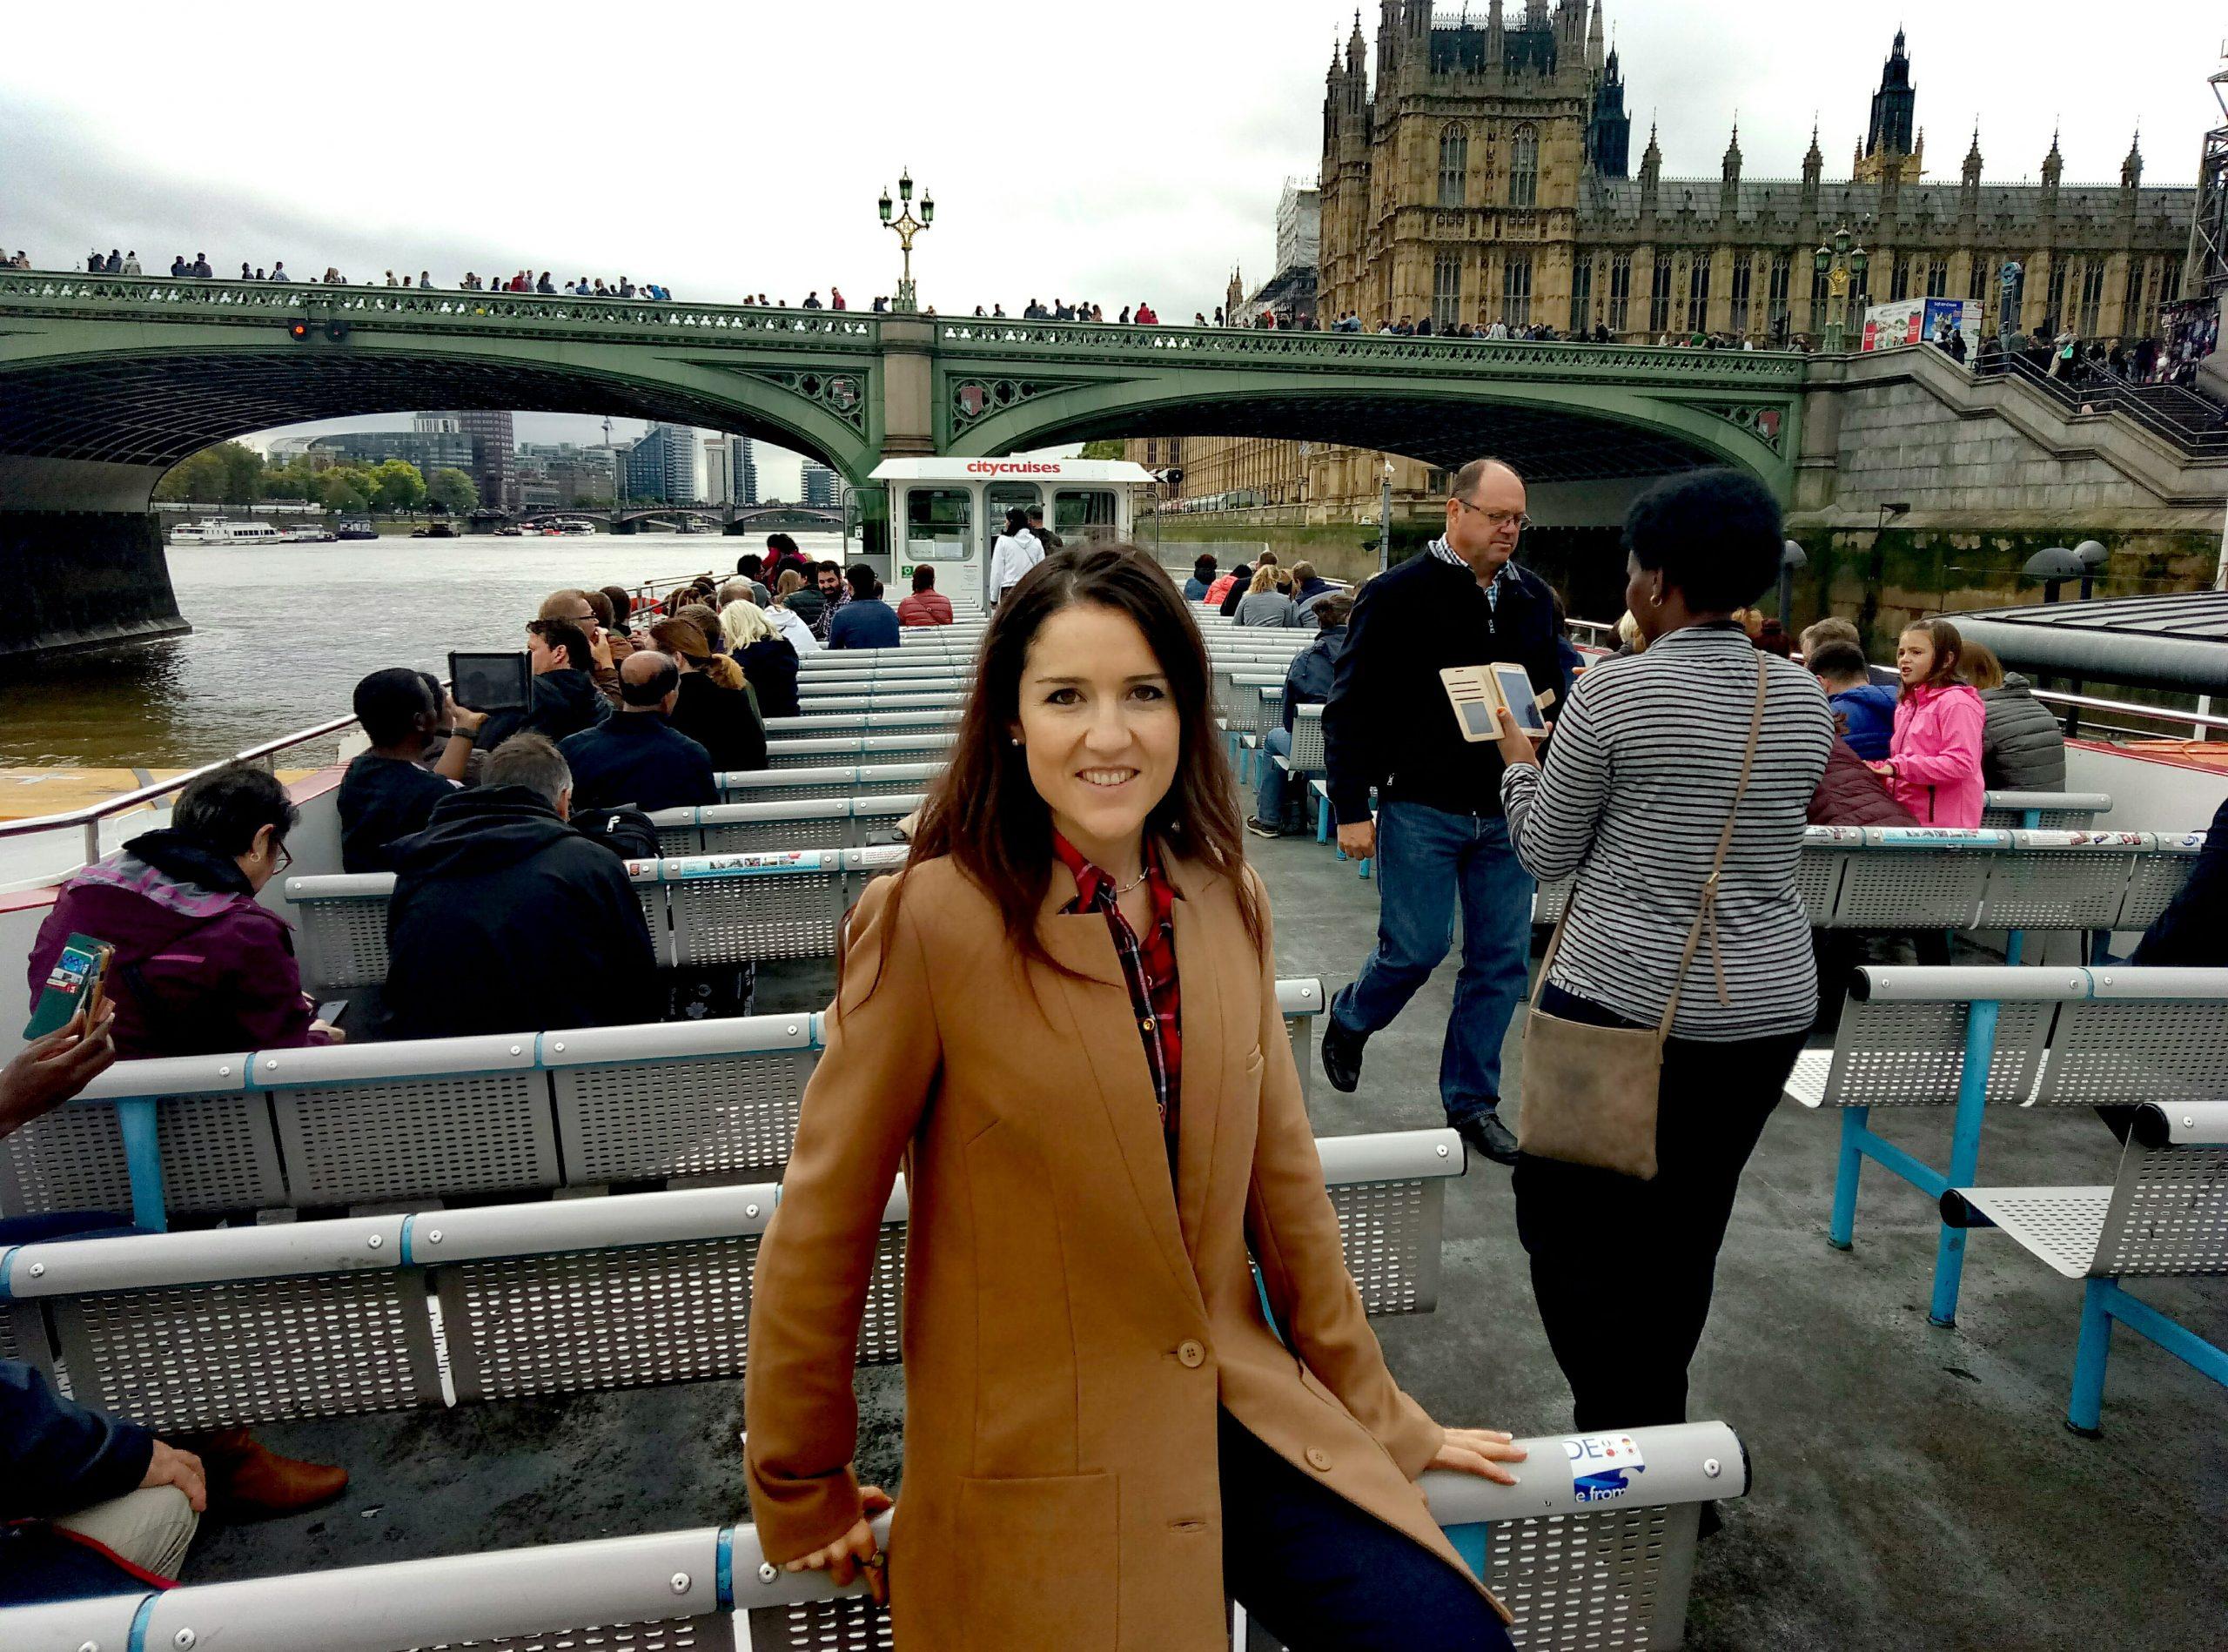 London Bridge natandcream